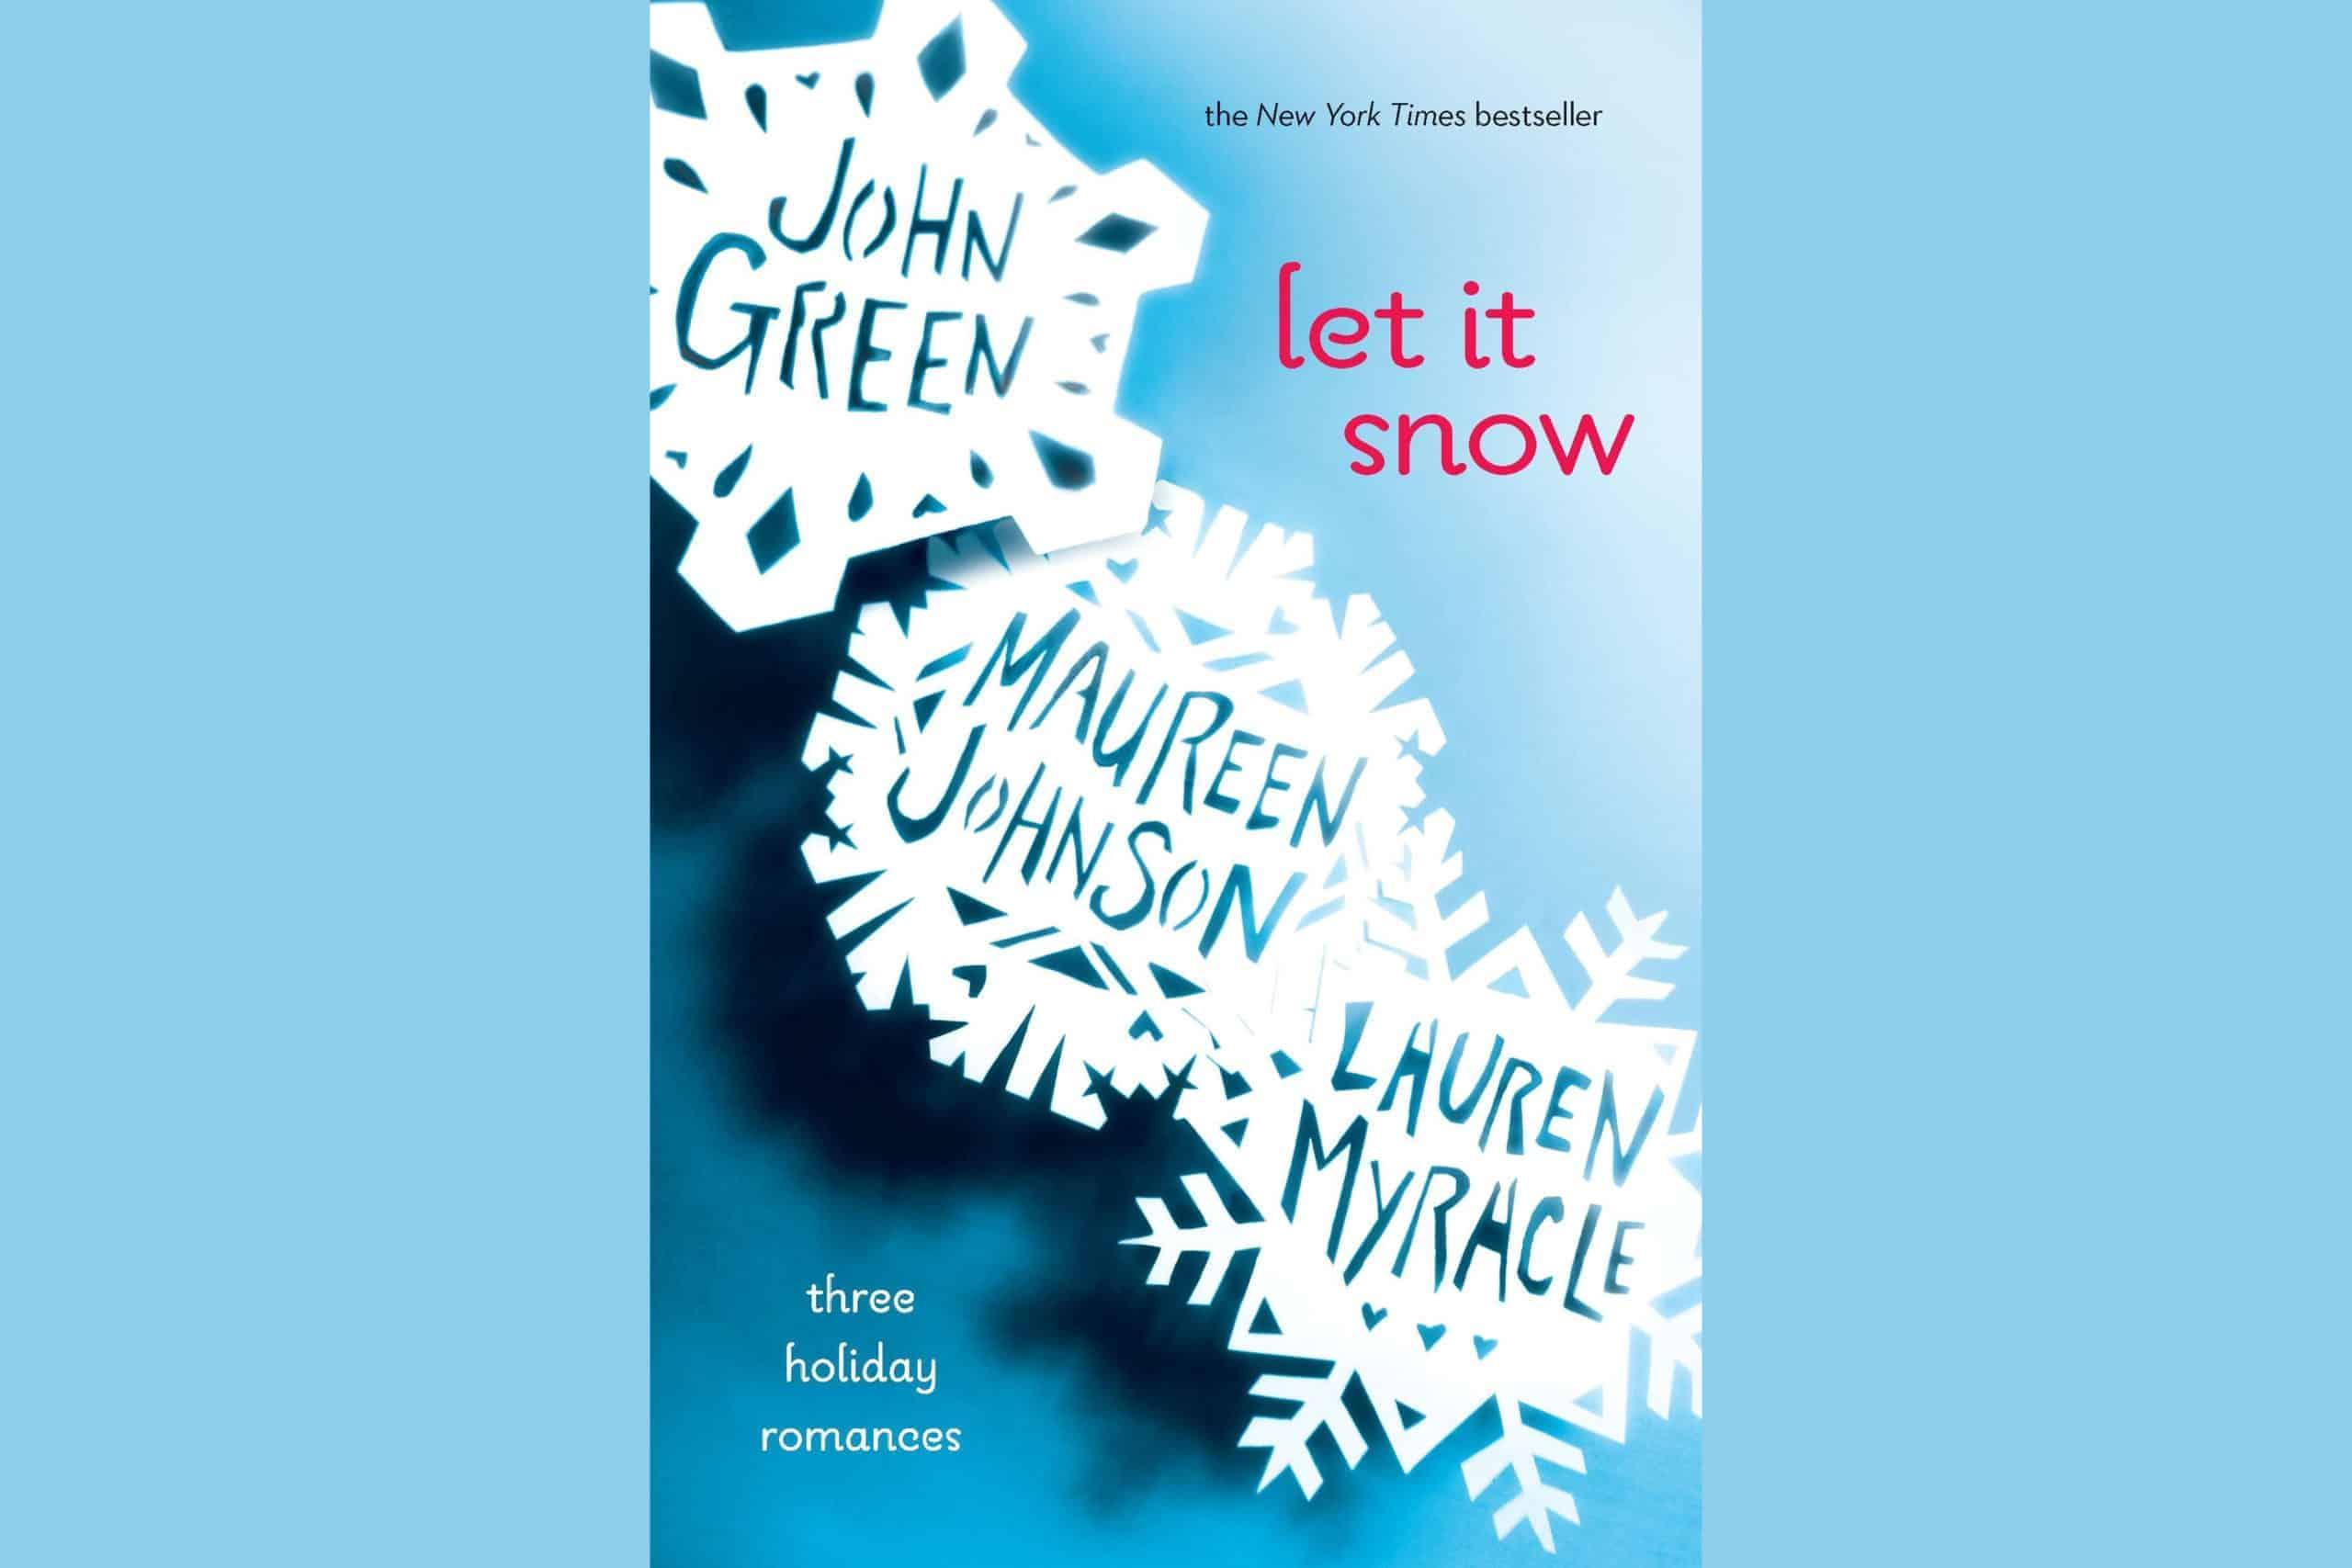 Let It Snow By John Green Maureen Johnson And Lauren Myracle